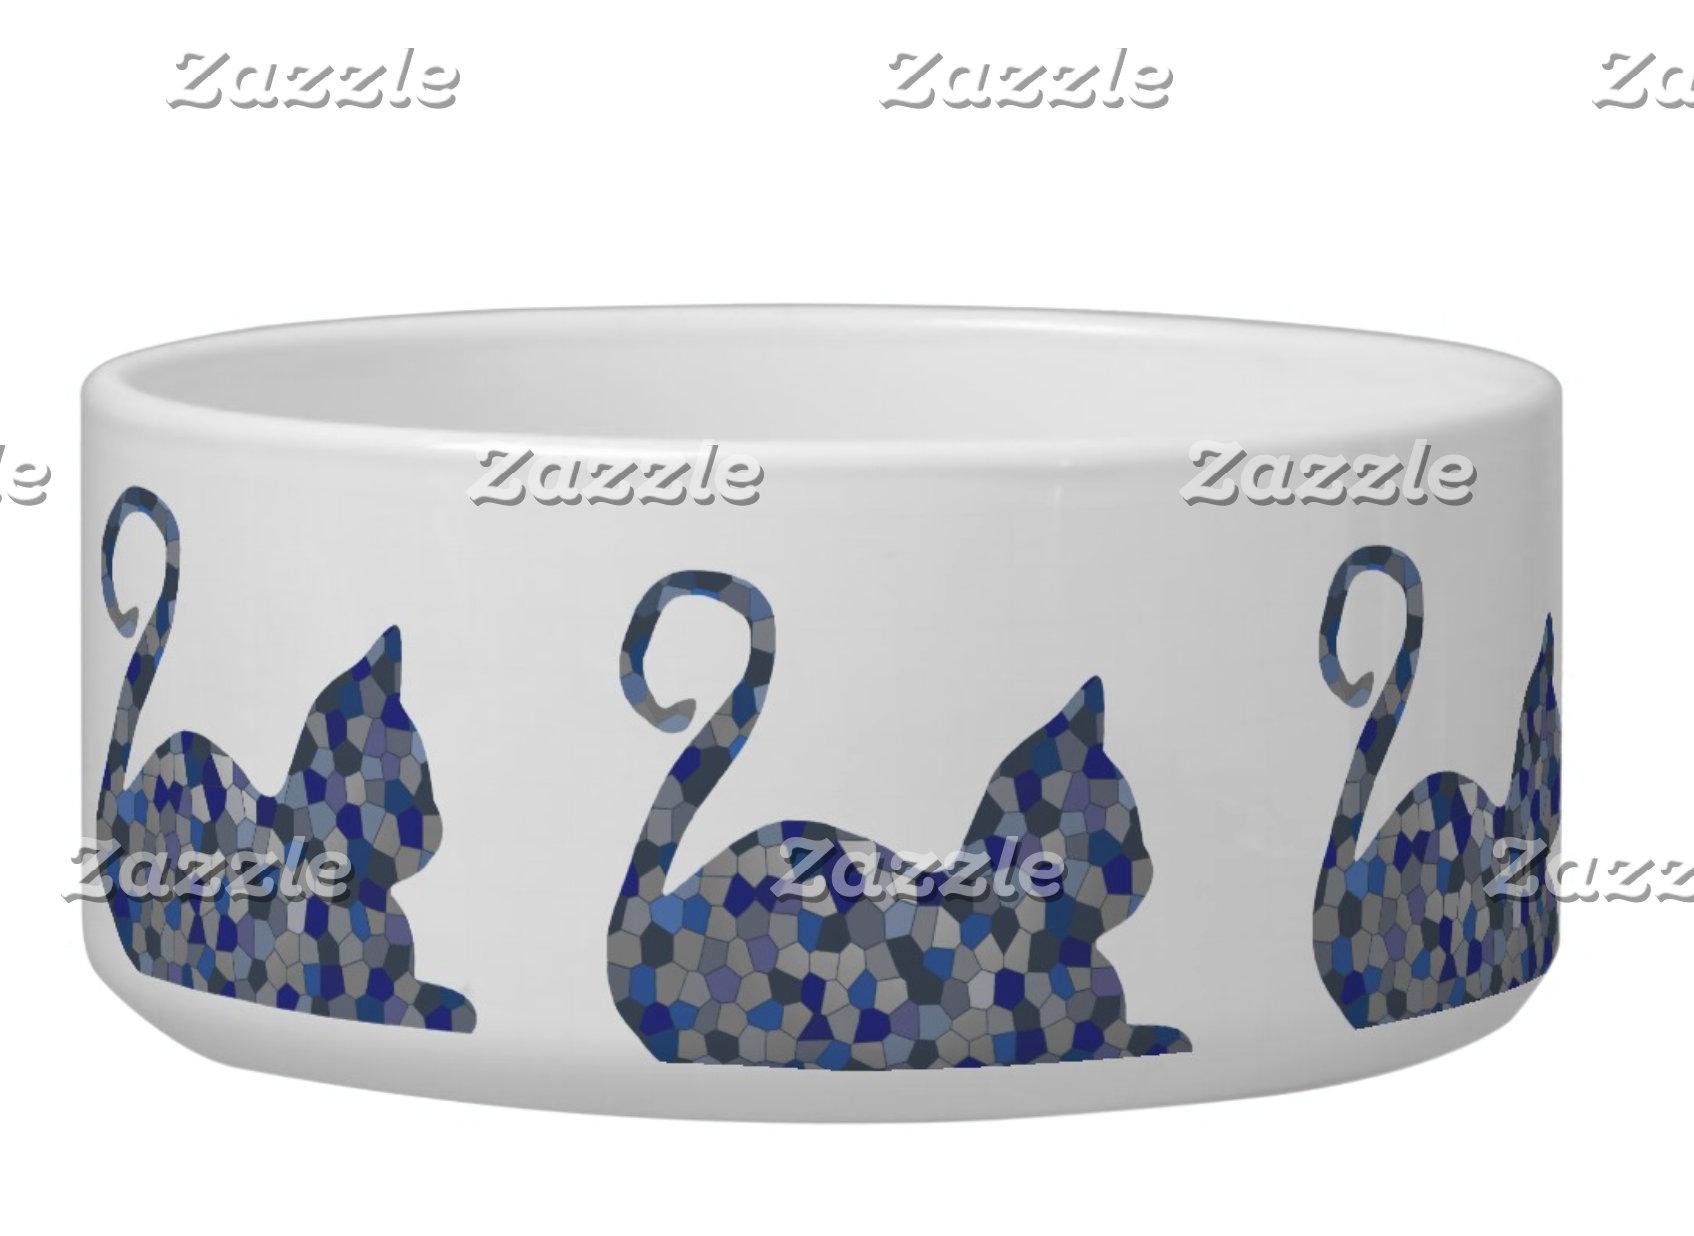 CrystalKatz Pet Bowls